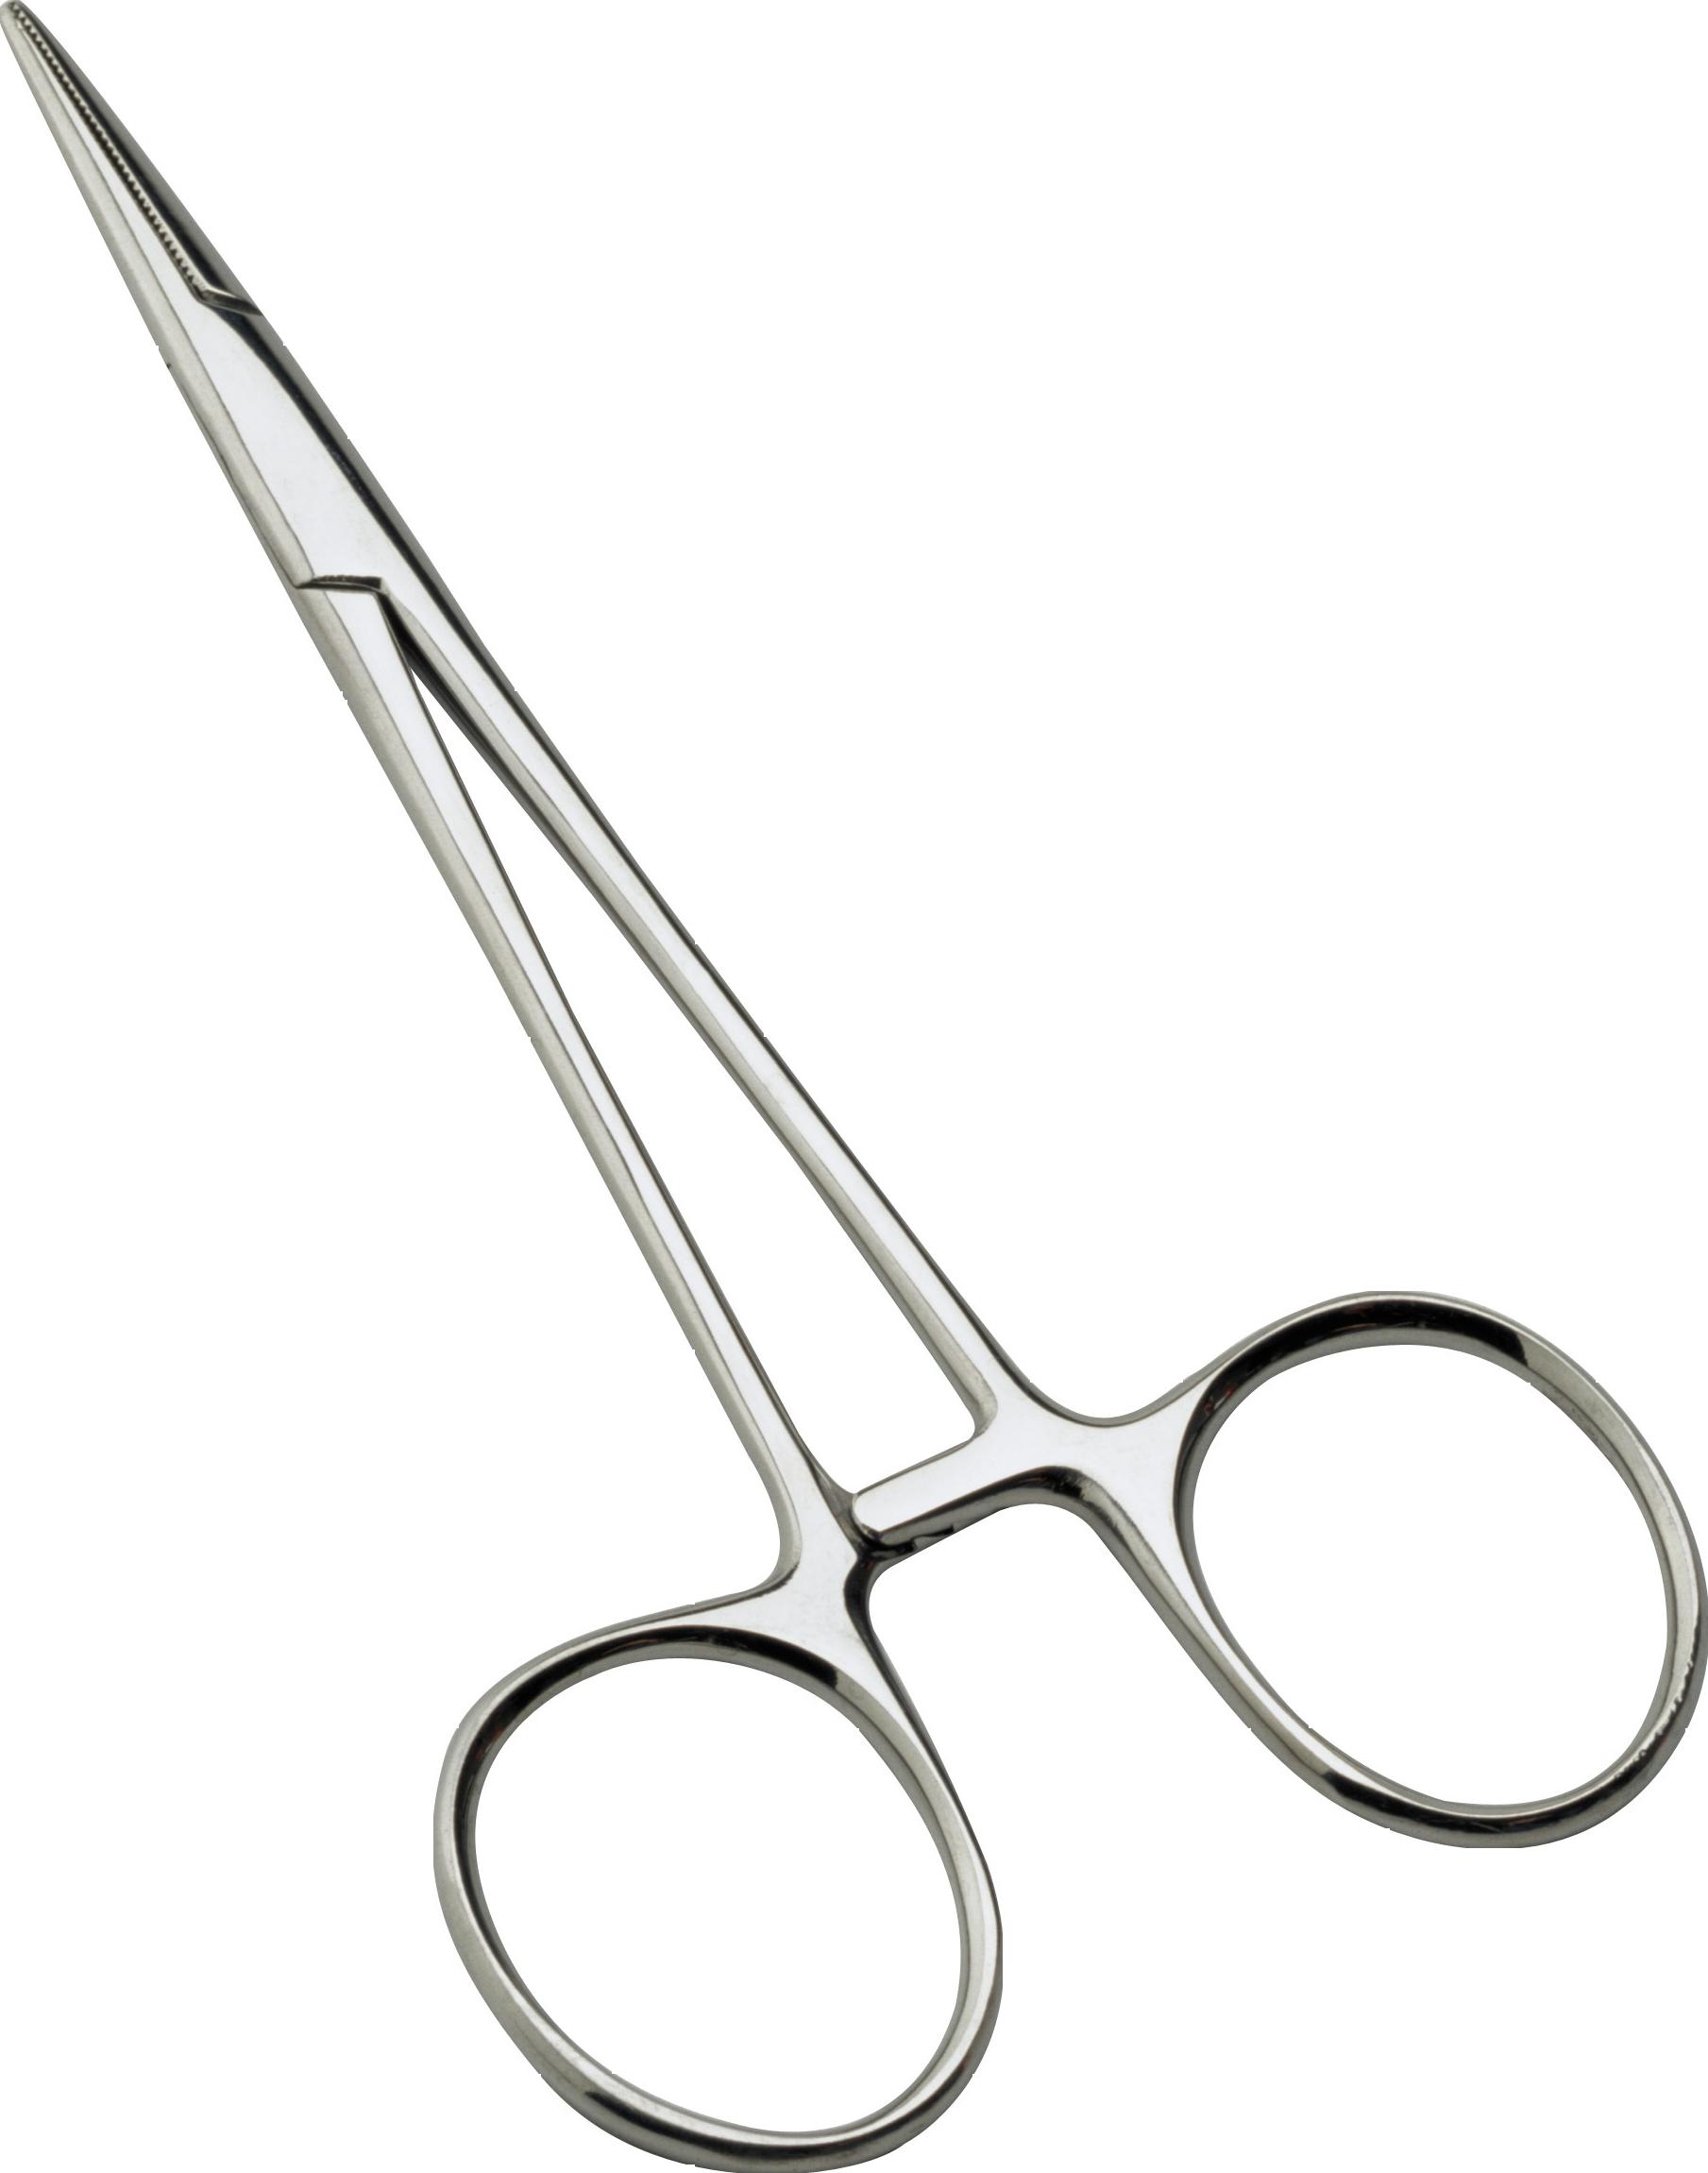 Best Kitchen Scissors Uk